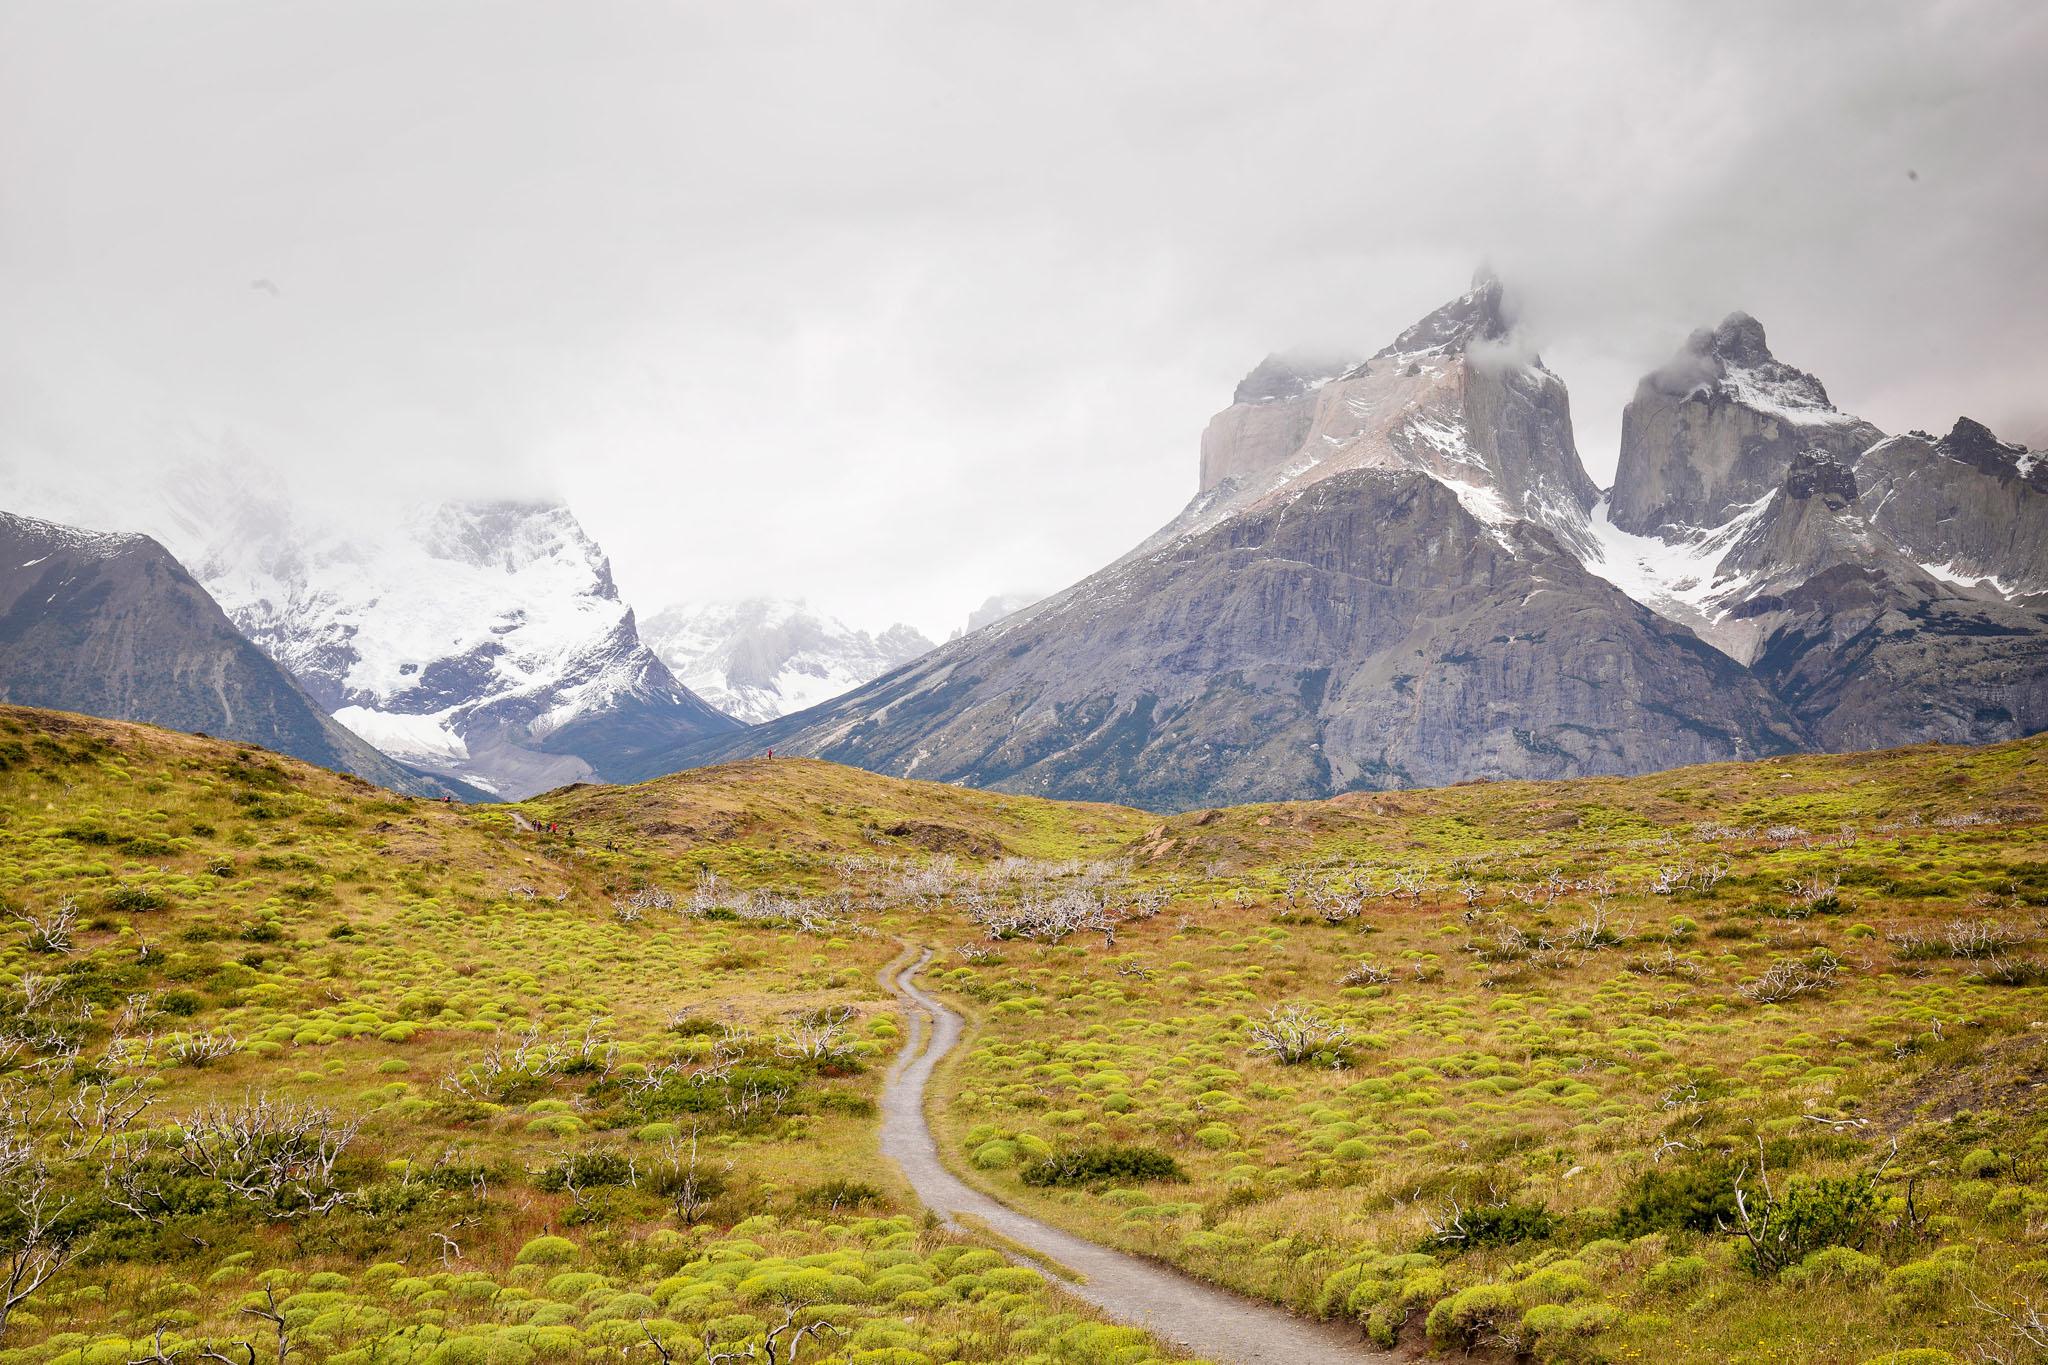 Wedding-Travellers-Overlanding-Destination-Wedding-Chile-Torres-del-Paine-los-cuernos-road-trail-viewpoint-mirador-fire-damage